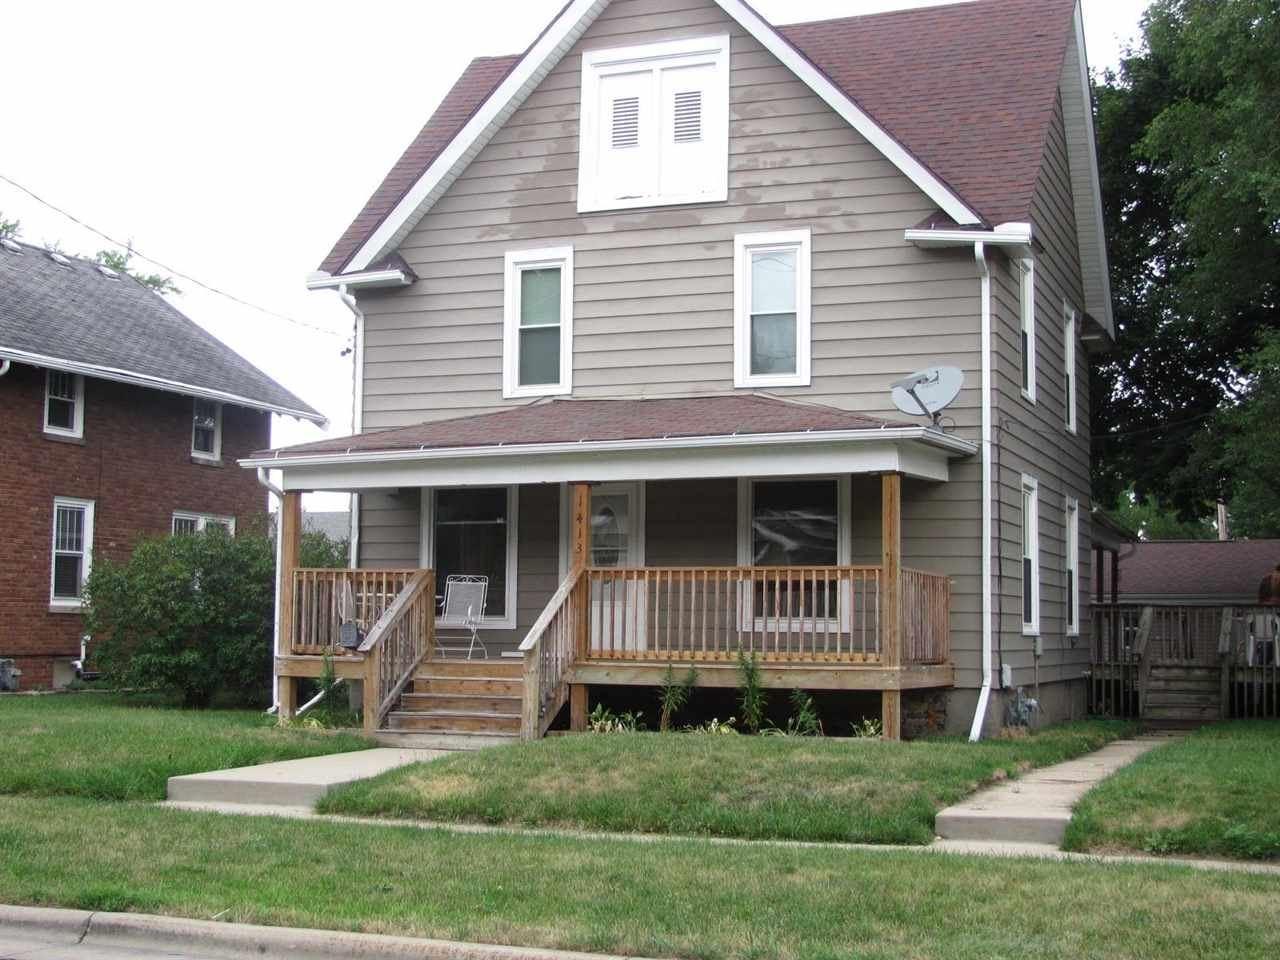 1413 St Lawrence Ave, Beloit, WI 53511 - #: 1913996